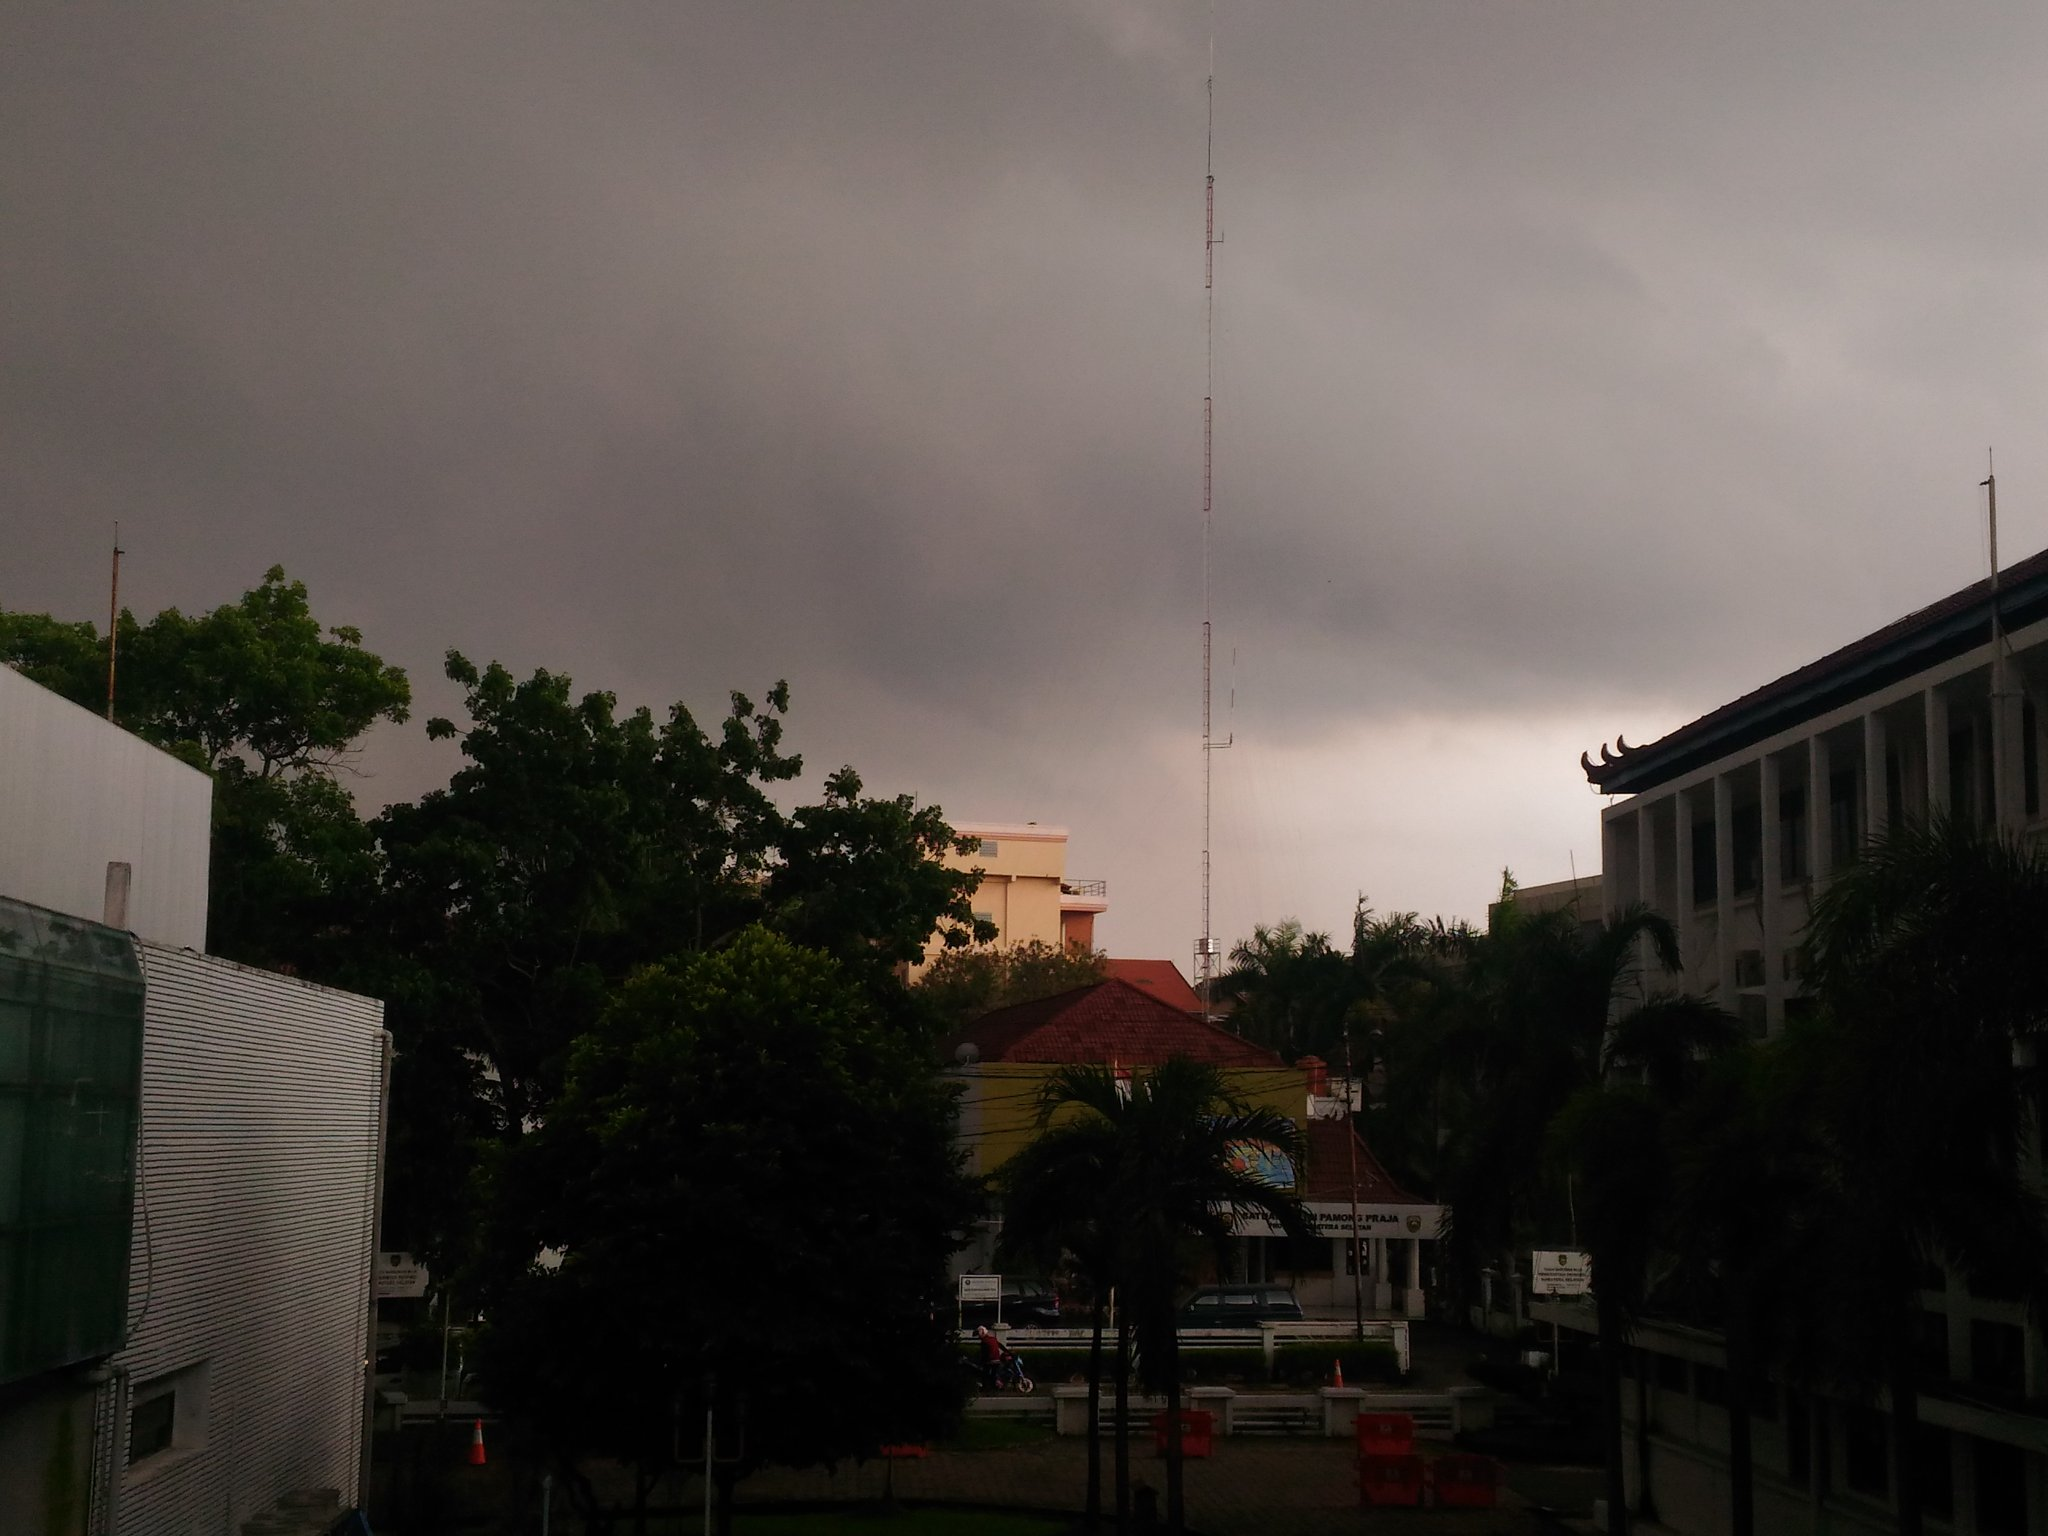 diguyuri-hujan-hampir-seharian-cuaca-palembang-gelap-radioelshinta-bnpb_indonesia-palembangtweet-httpst-cowhzzcr4jkd